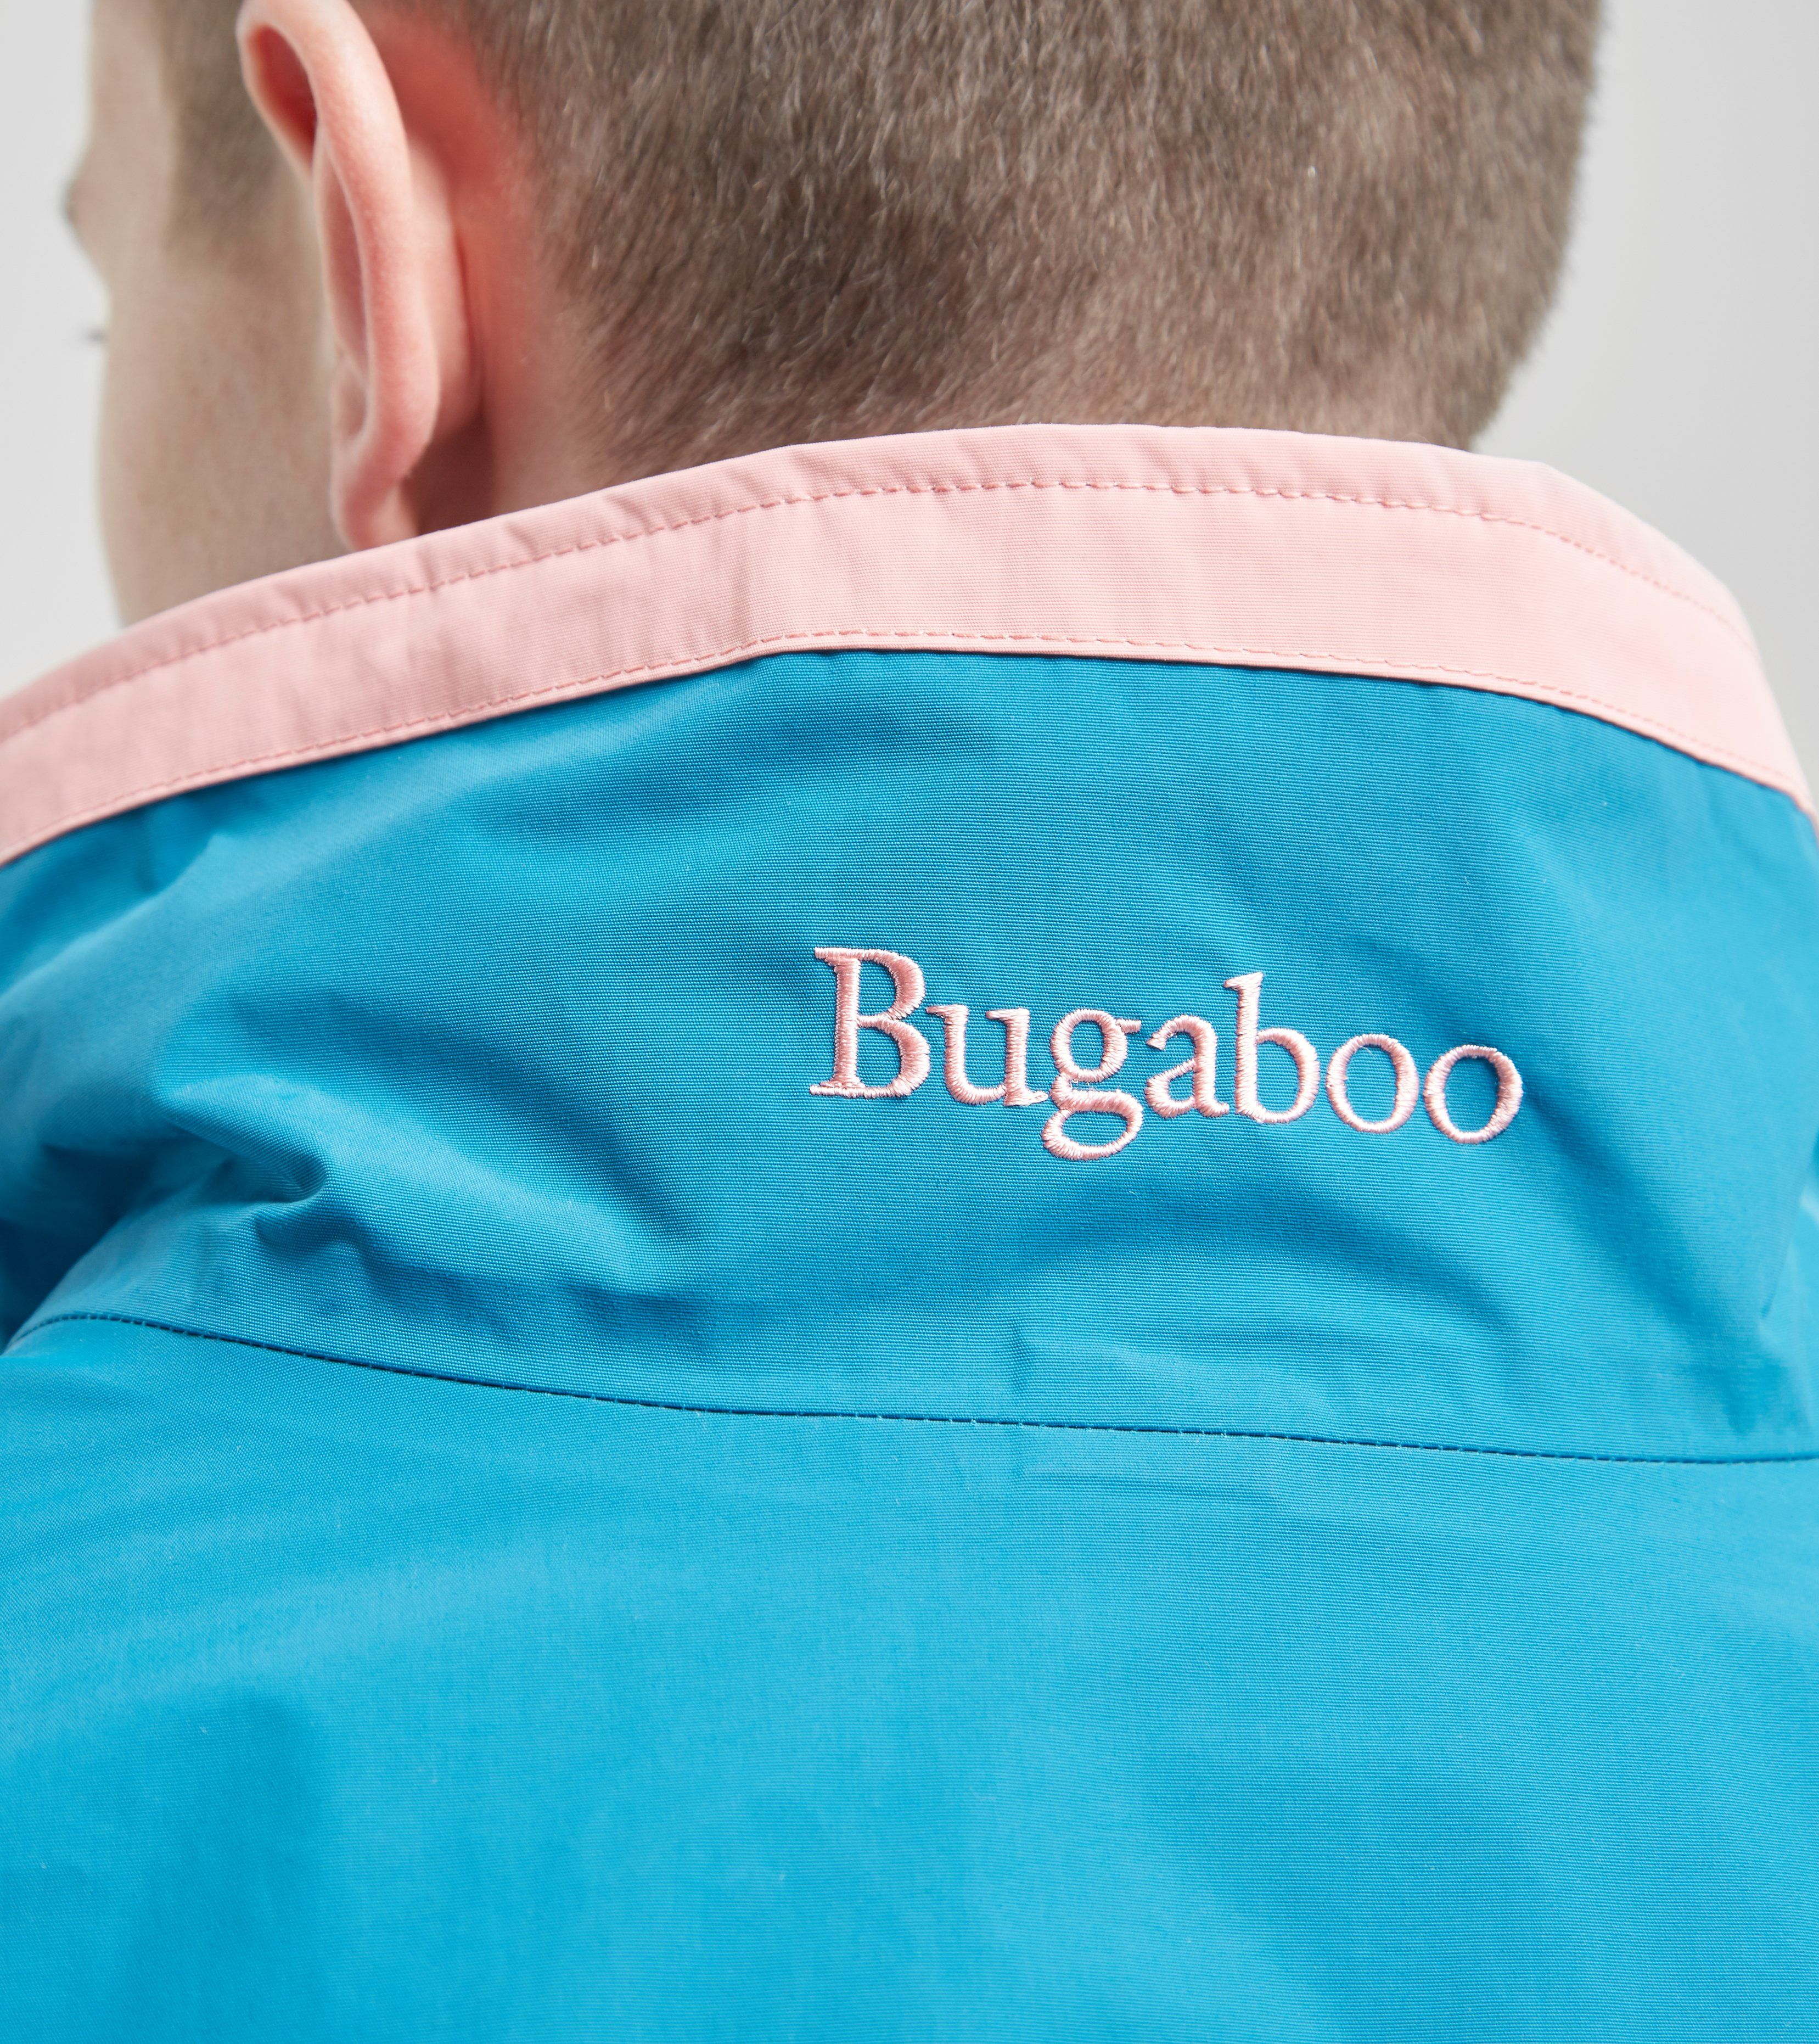 Columbia Bugaboo - size? Exclusive